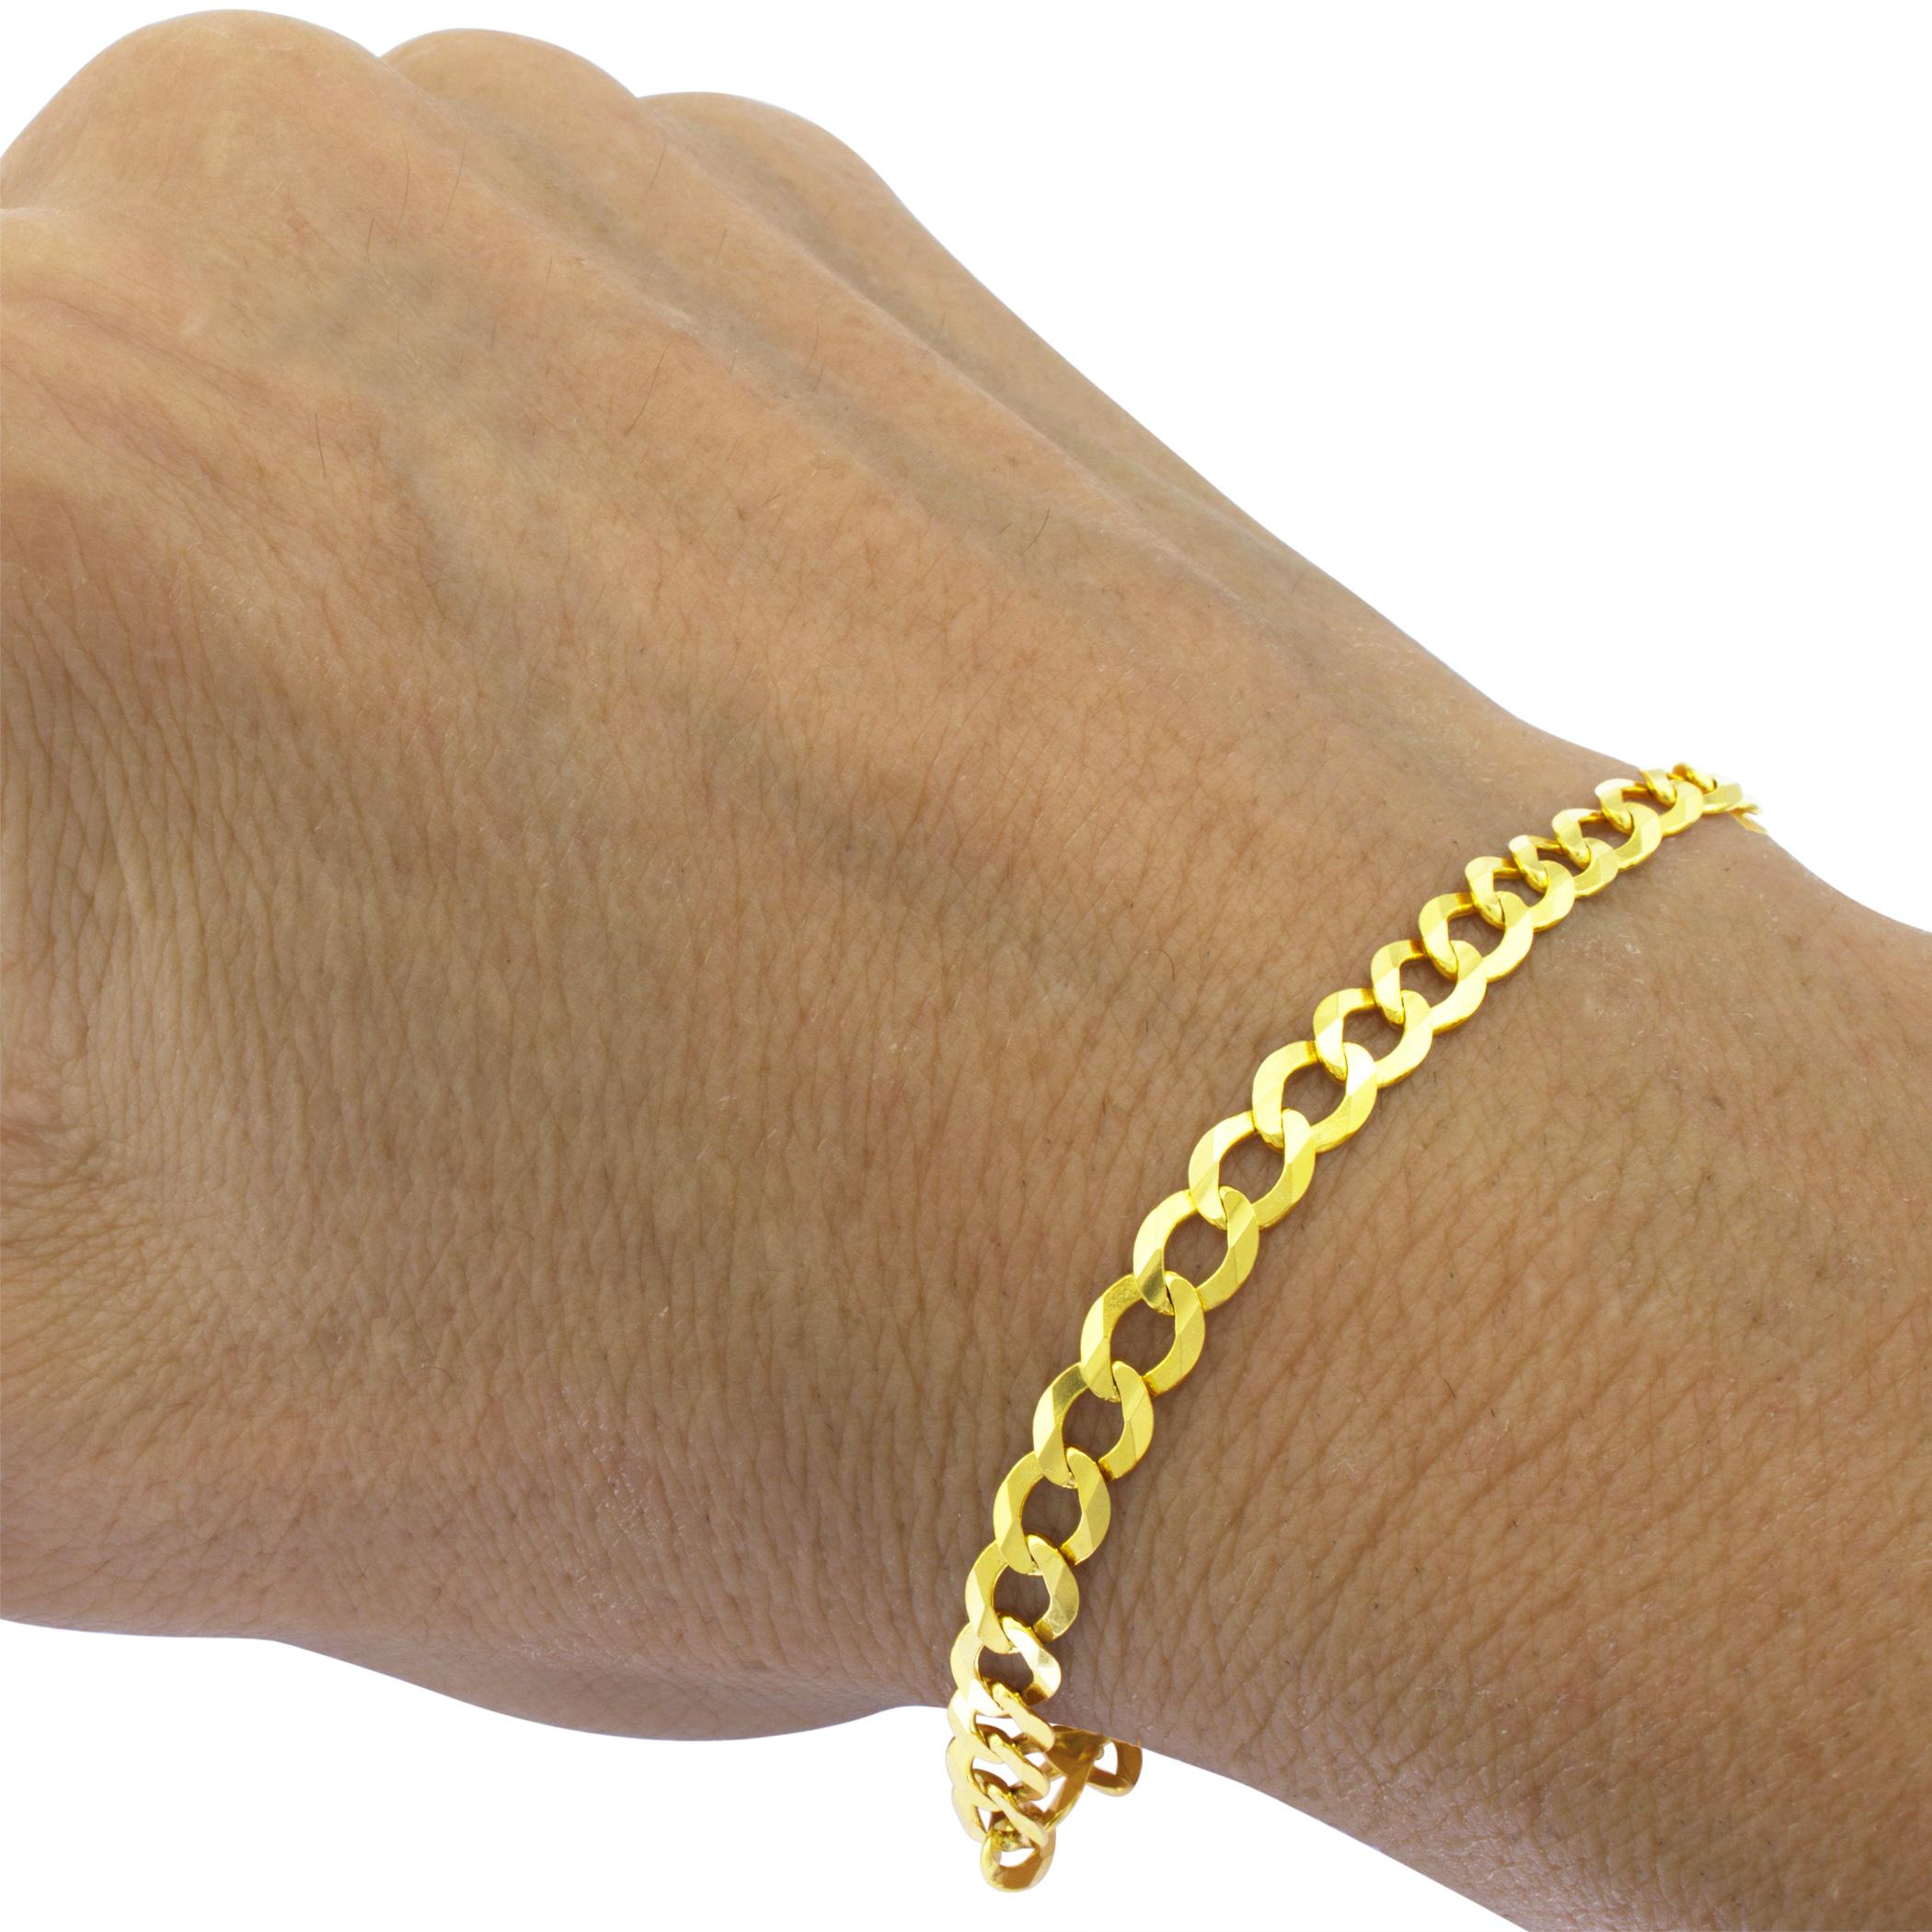 14K-Yellow-Gold-5-5mm-Italian-Curb-Cuban-Link-Chain-Bracelet-Mens-Women-7-034-8-034-9-034 thumbnail 13